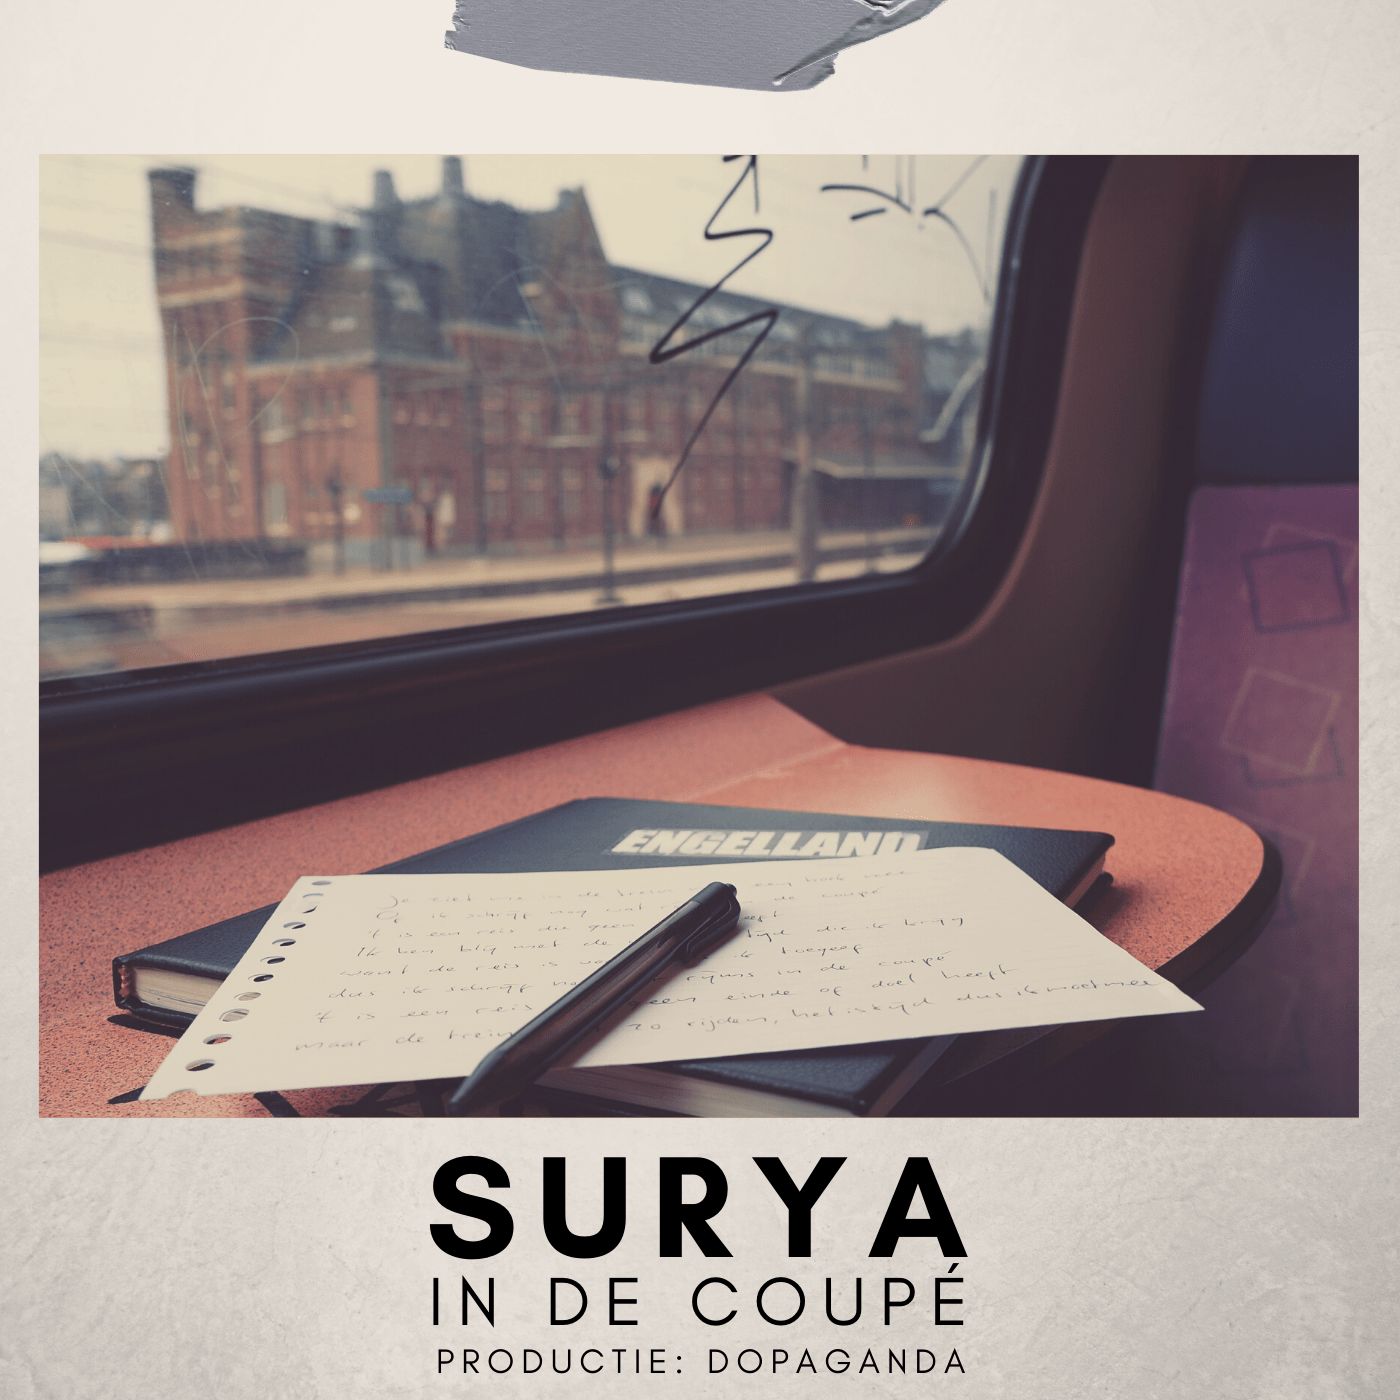 Surya - In de Coupé